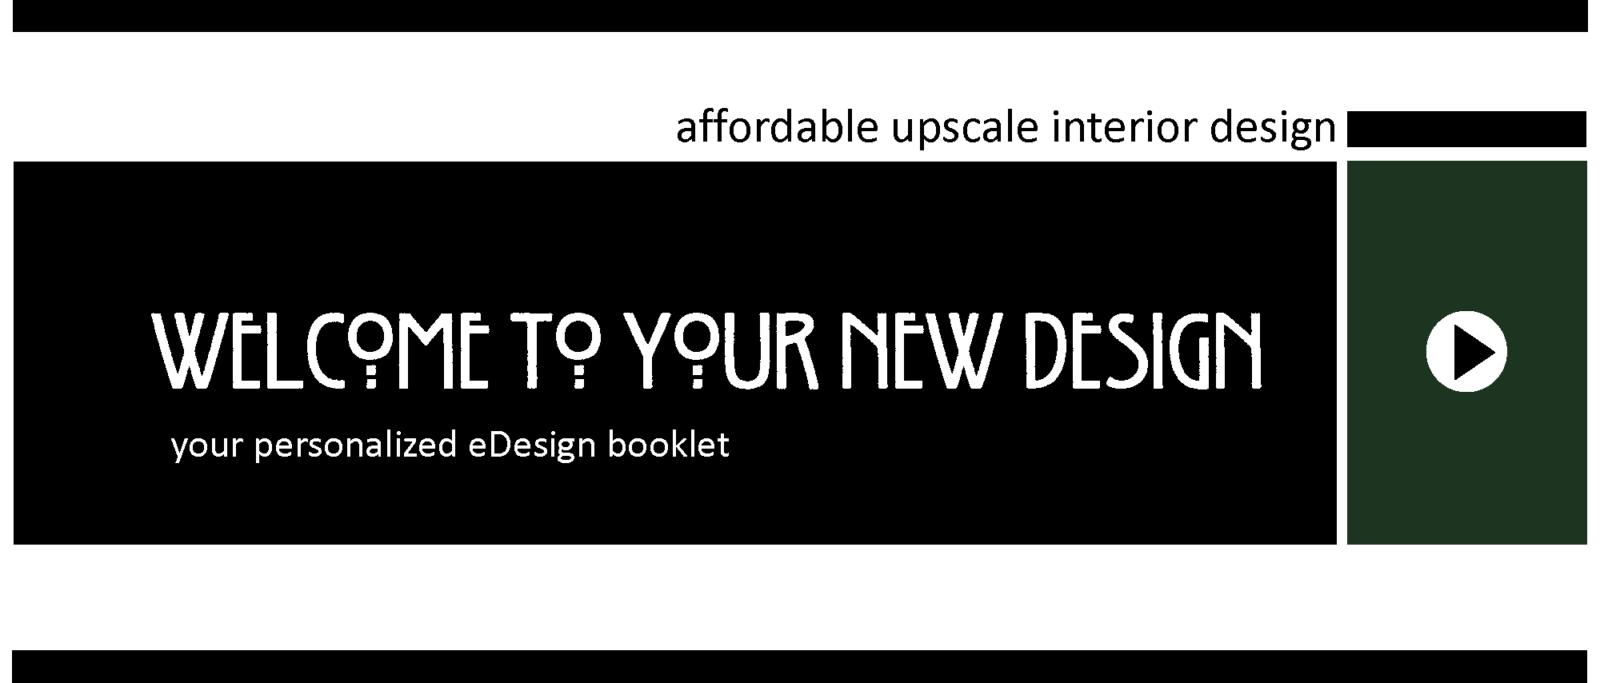 Edesign Gail Green Interiors Edesign High End Affordable Interior Design